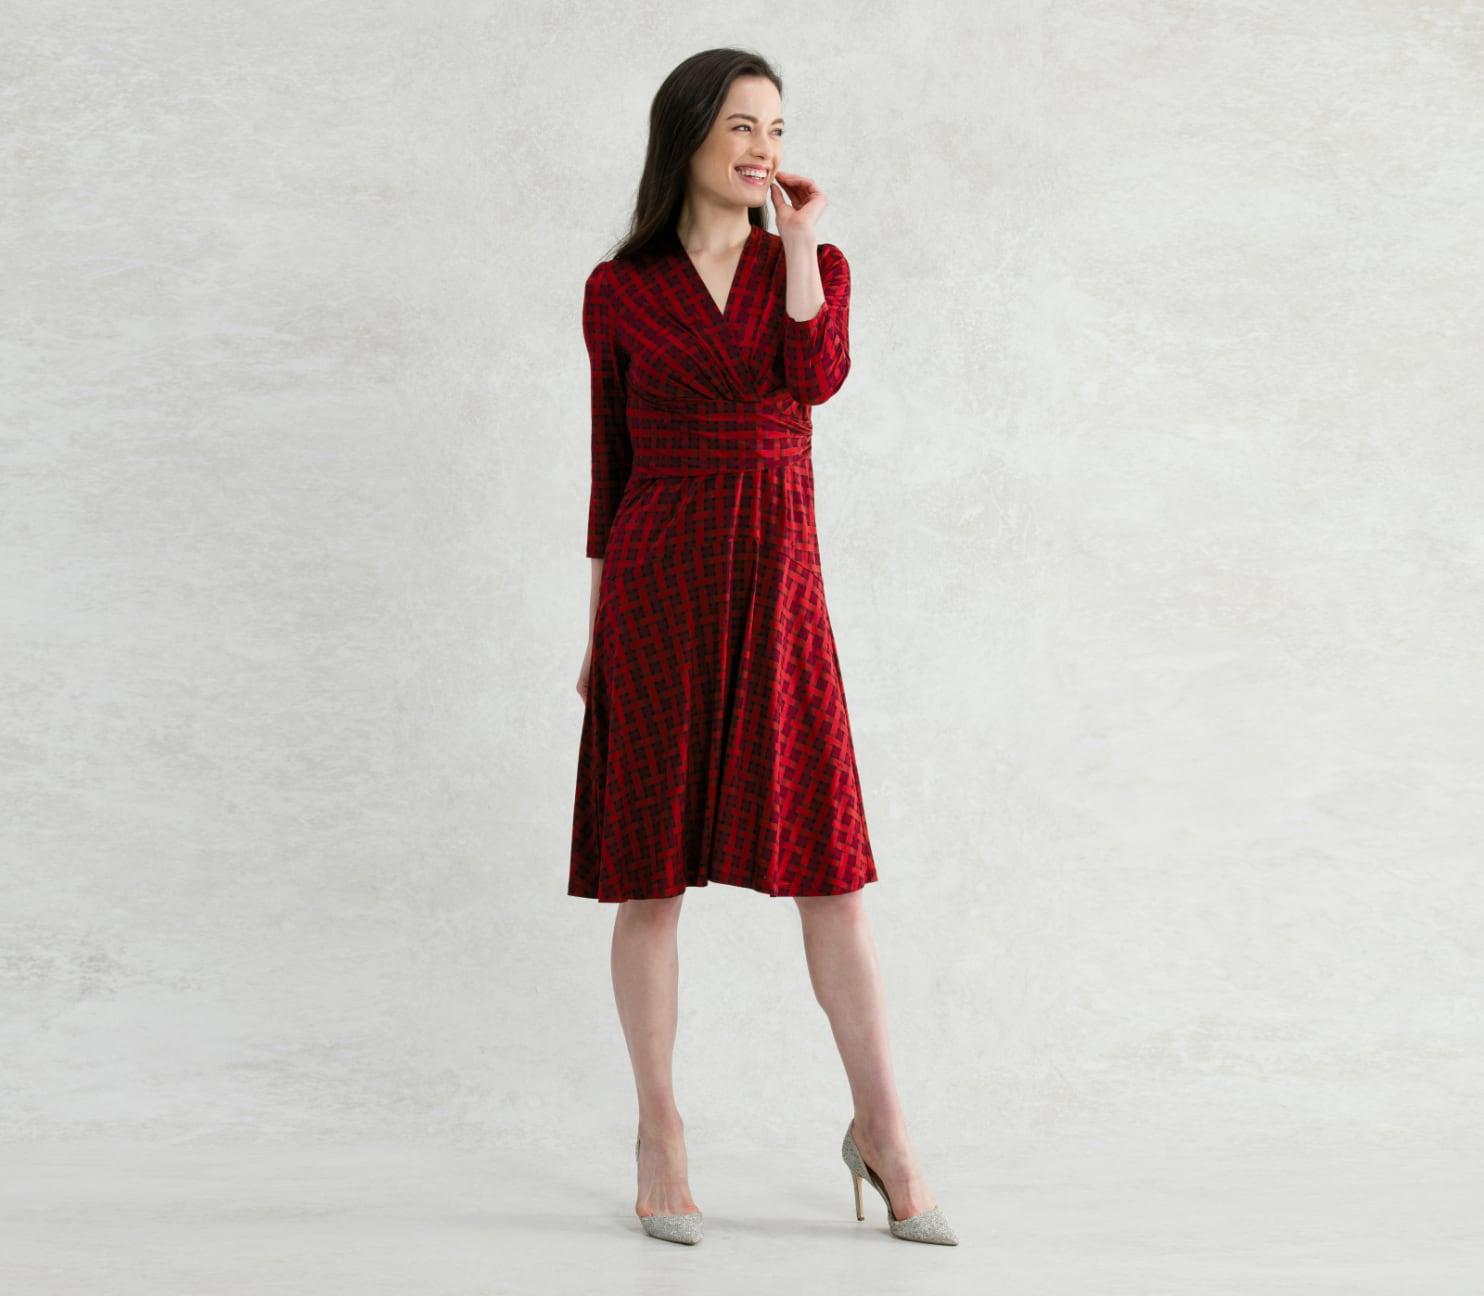 05_Thumbnail_Red_Check_CacheCoeur_Dress.jpg